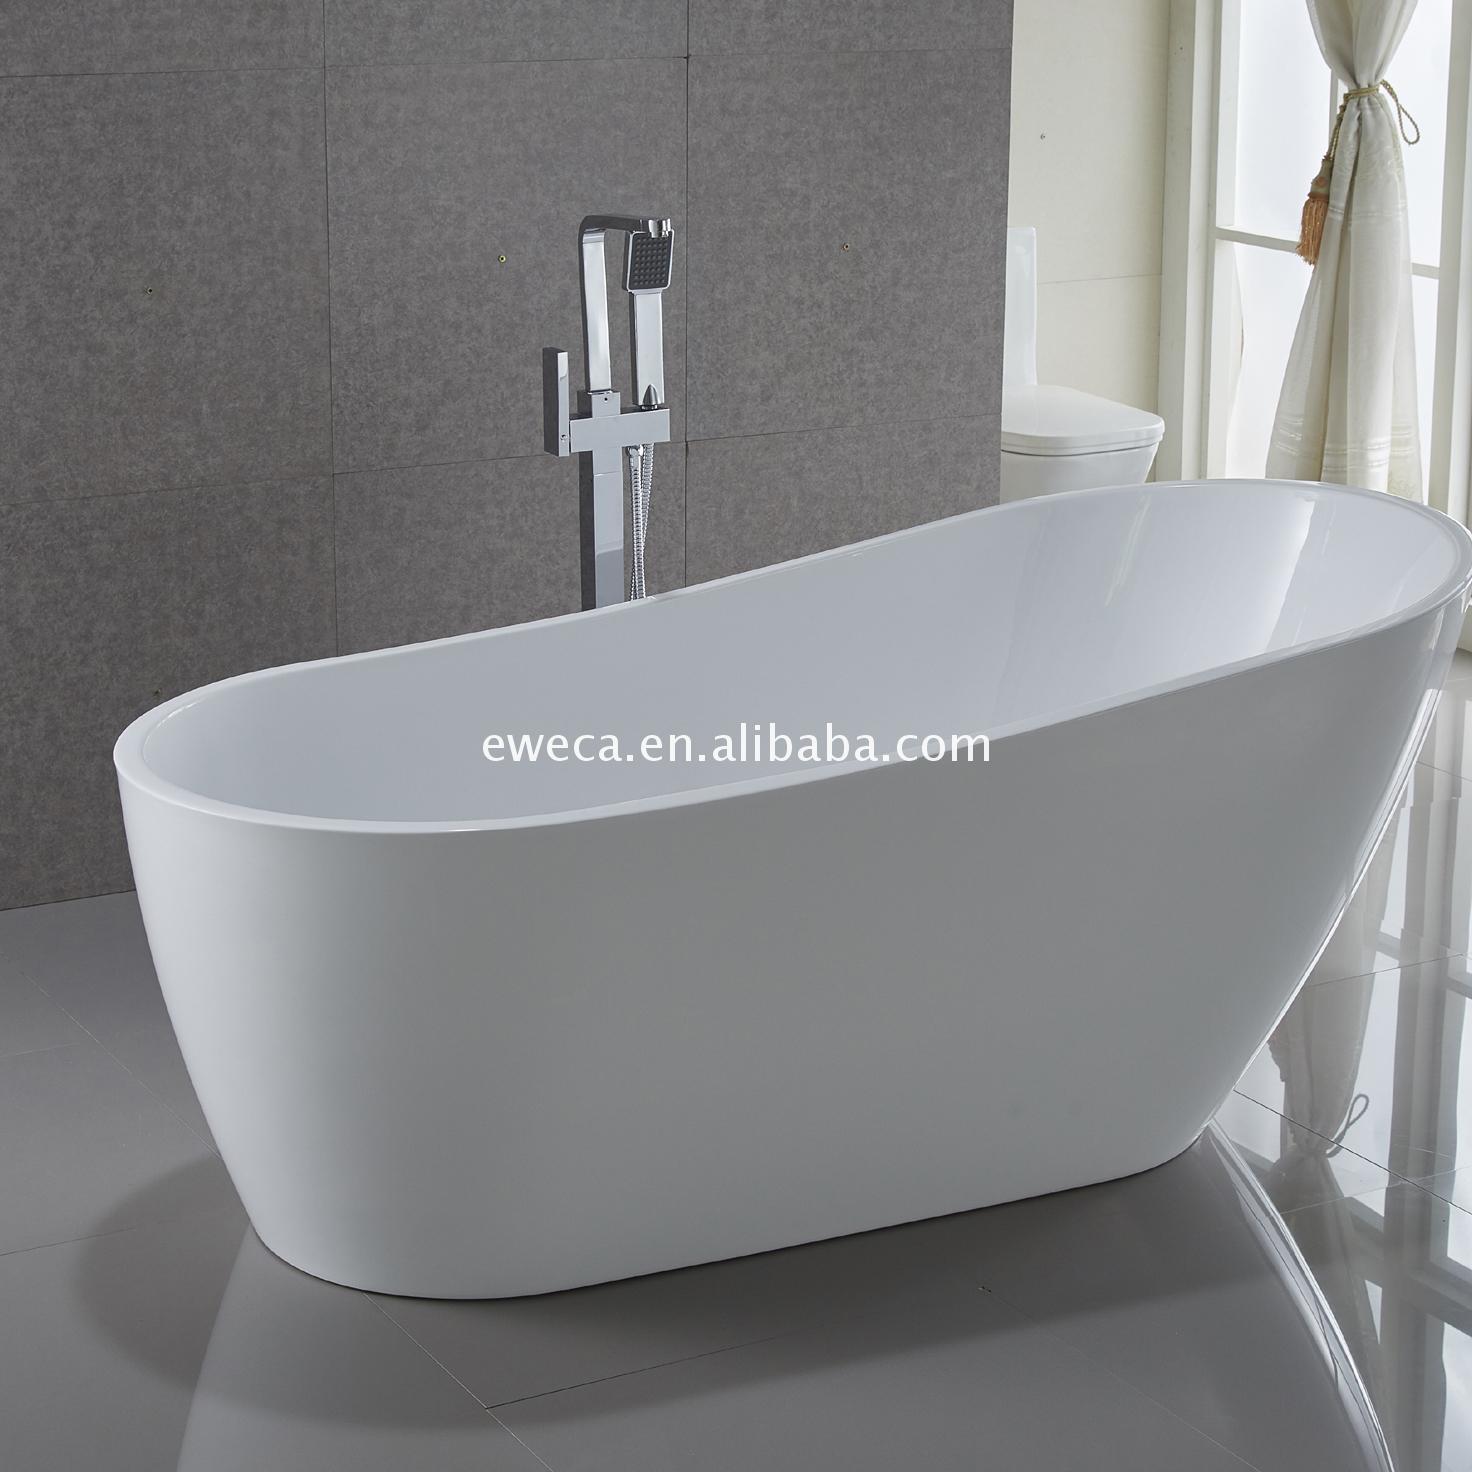 product group aquatica surface stone solid bathtub bathtubs ofuro plumbing oval prod freestanding true